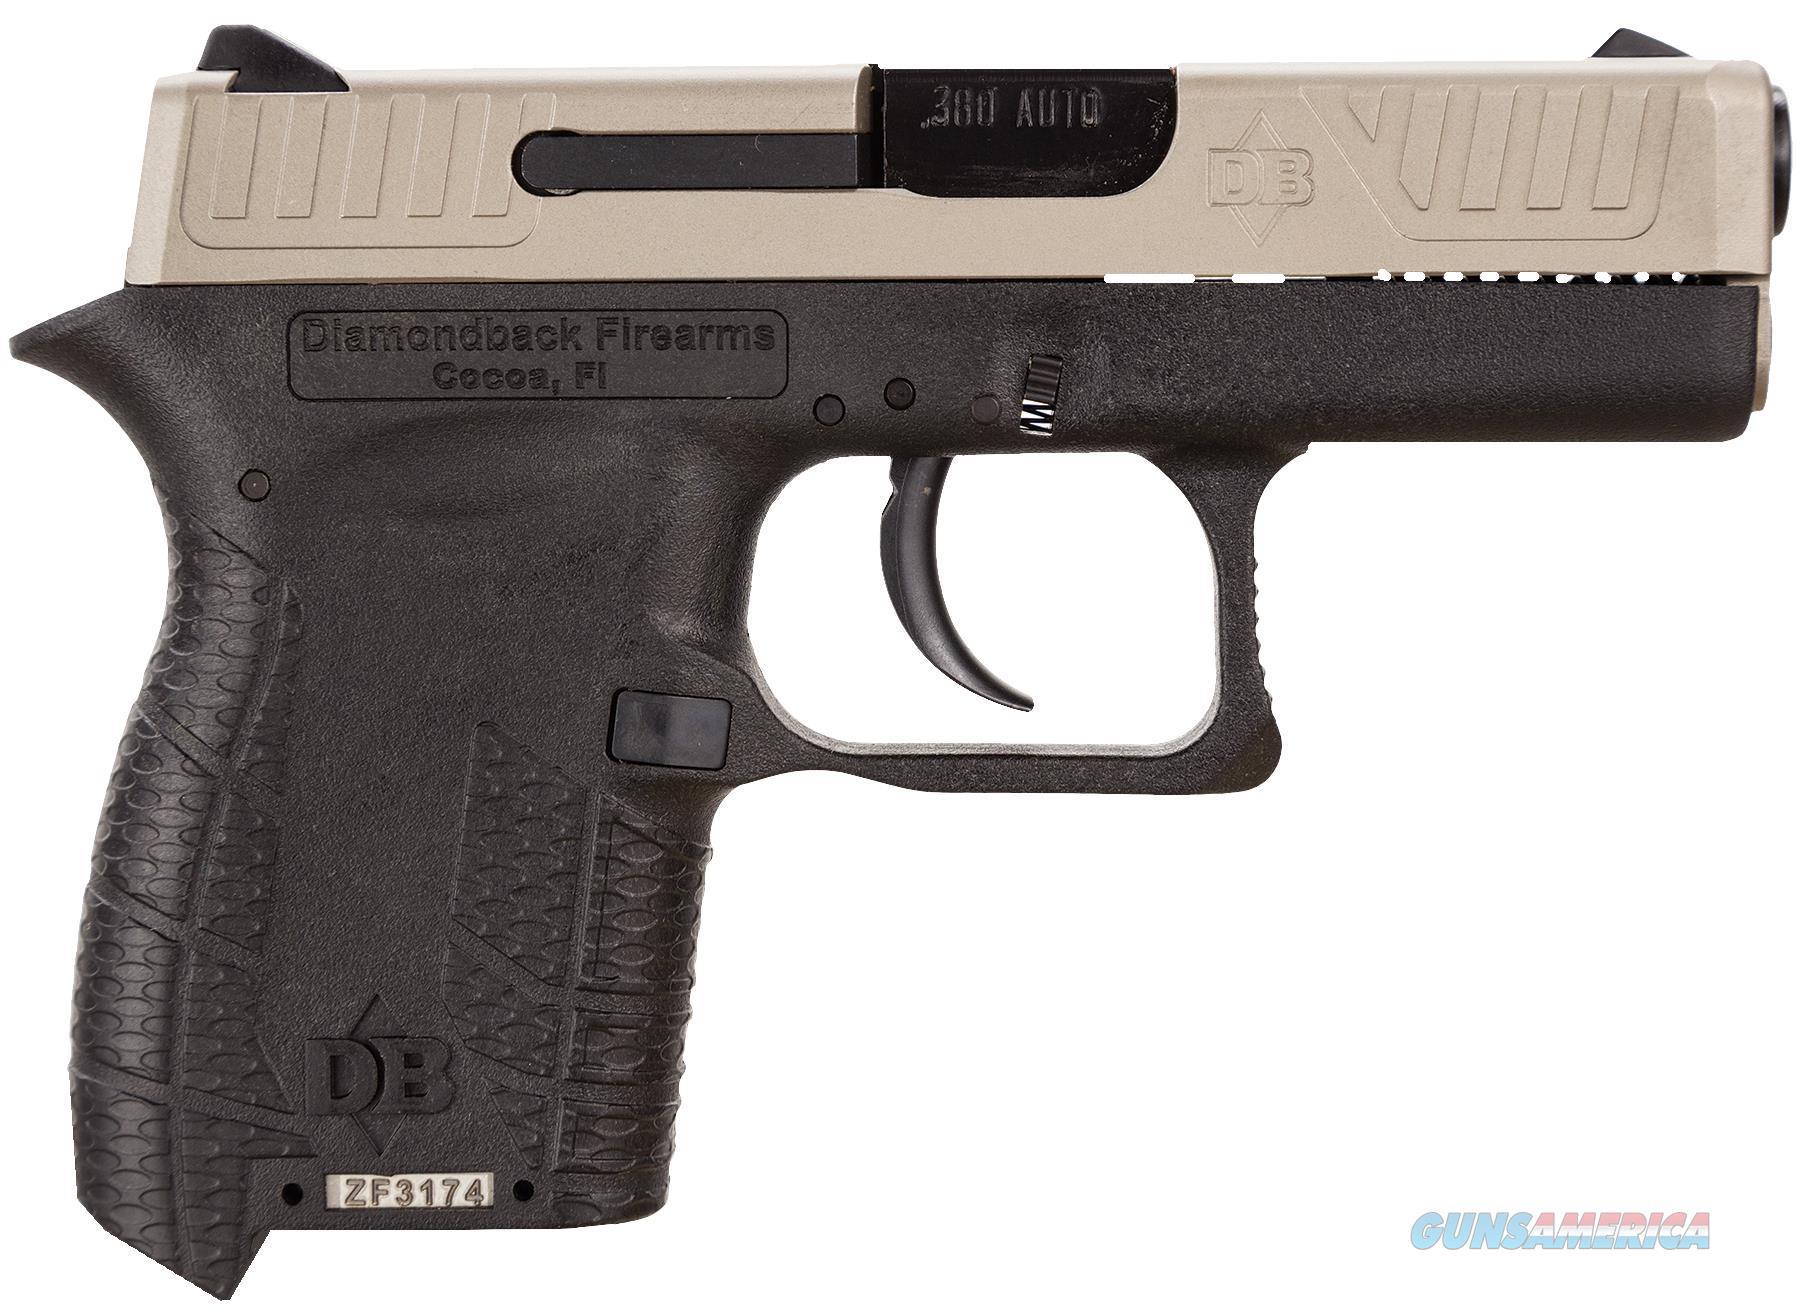 Diamondback Firearms Db380 380Acp 2.8 Ex Slide Compact 6Rd DB380EX  Guns > Pistols > D Misc Pistols